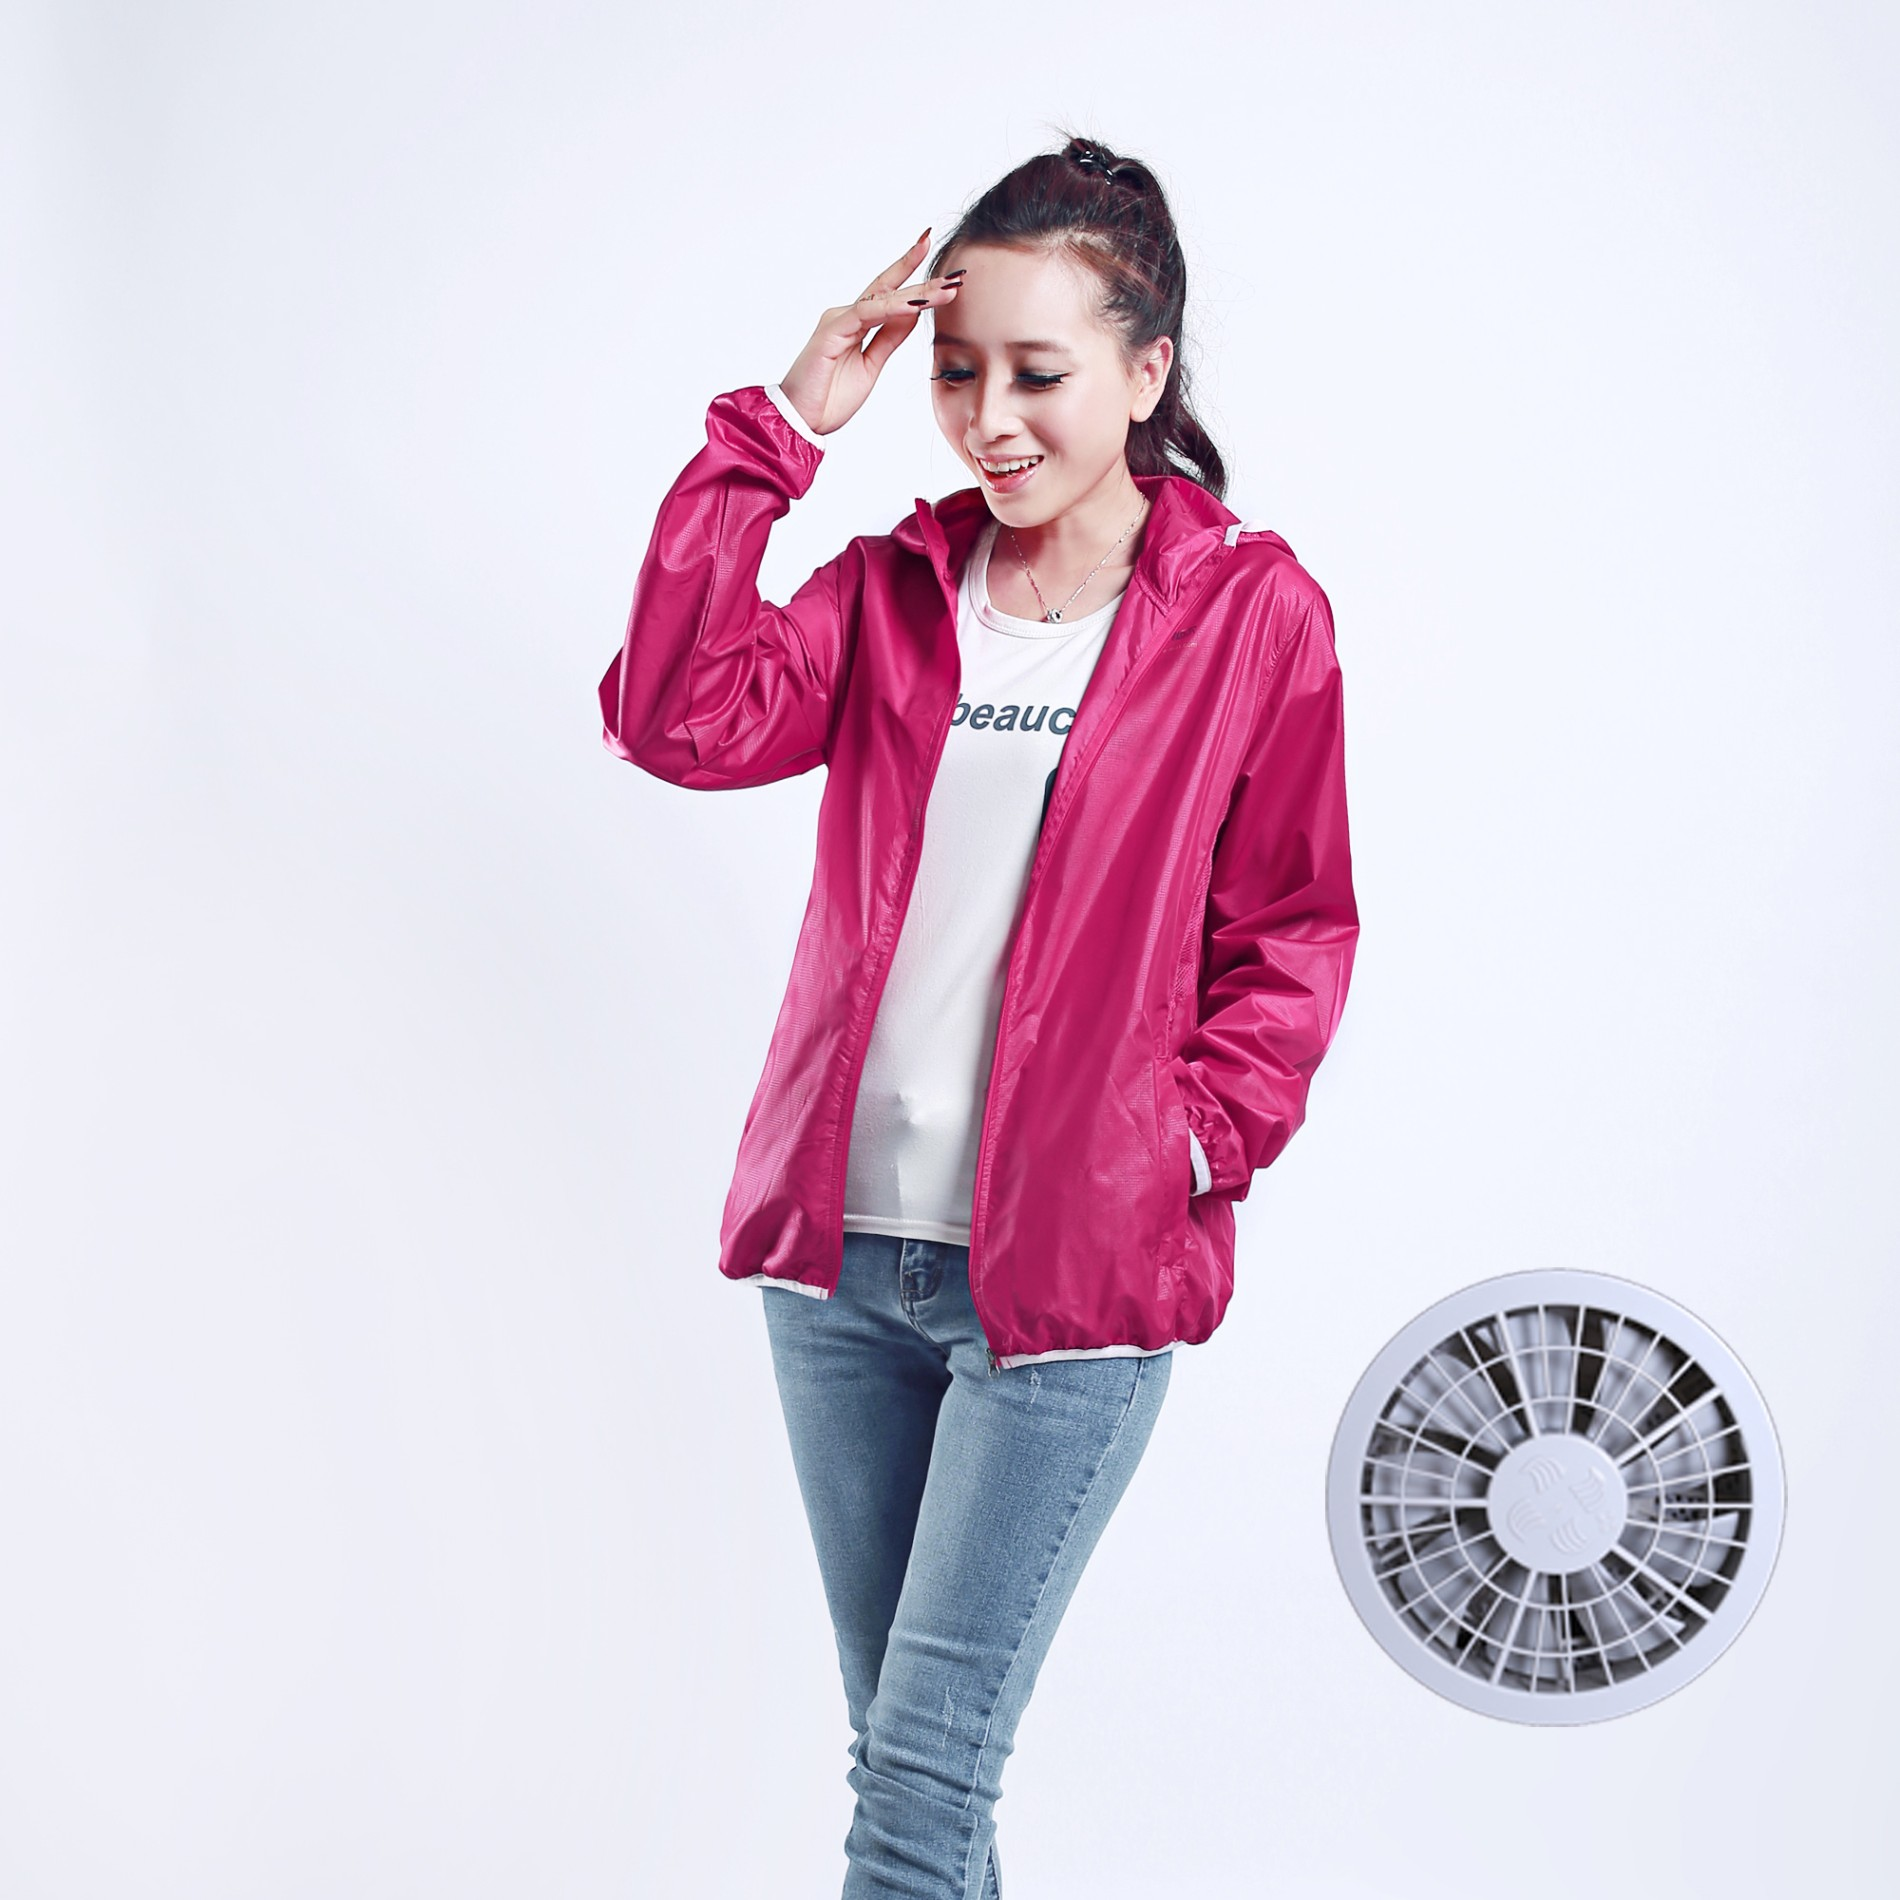 ladies cooling Jacket Manufacturers, ladies cooling Jacket Factory, Supply ladies cooling Jacket